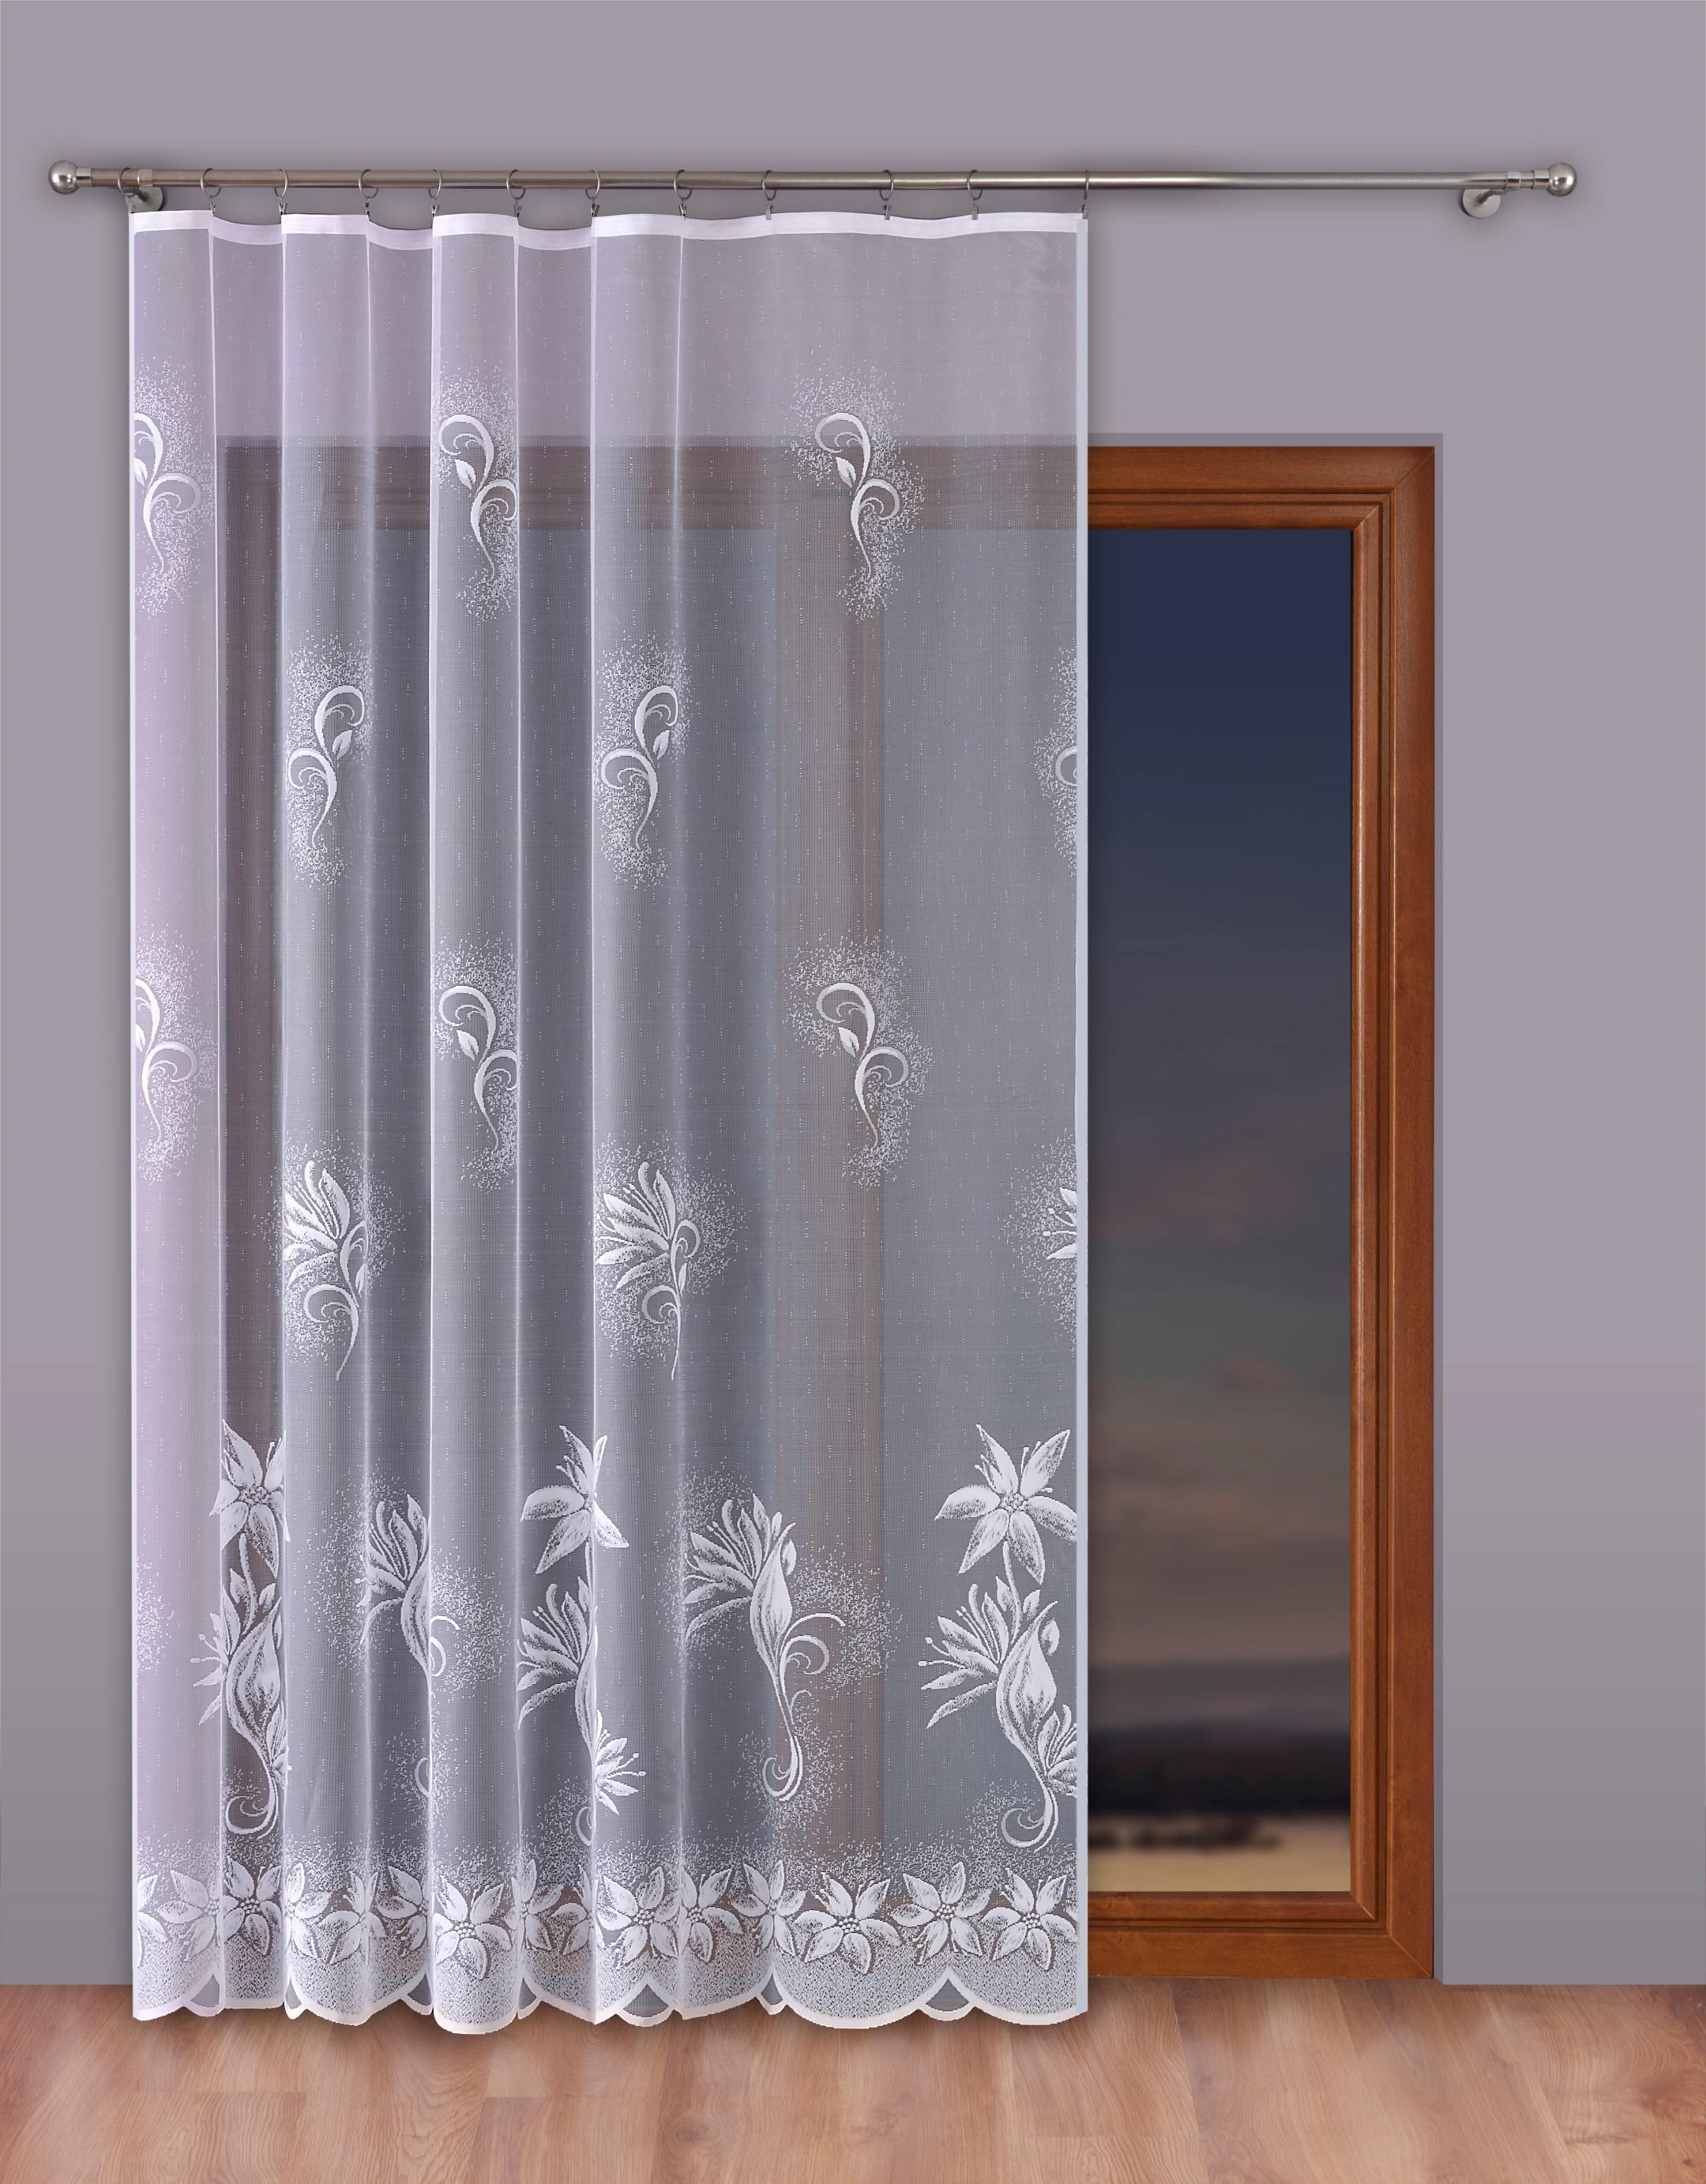 Шторы Primavera Классические шторы Moise Цвет: Белый шторы primavera классические шторы didi цвет белый